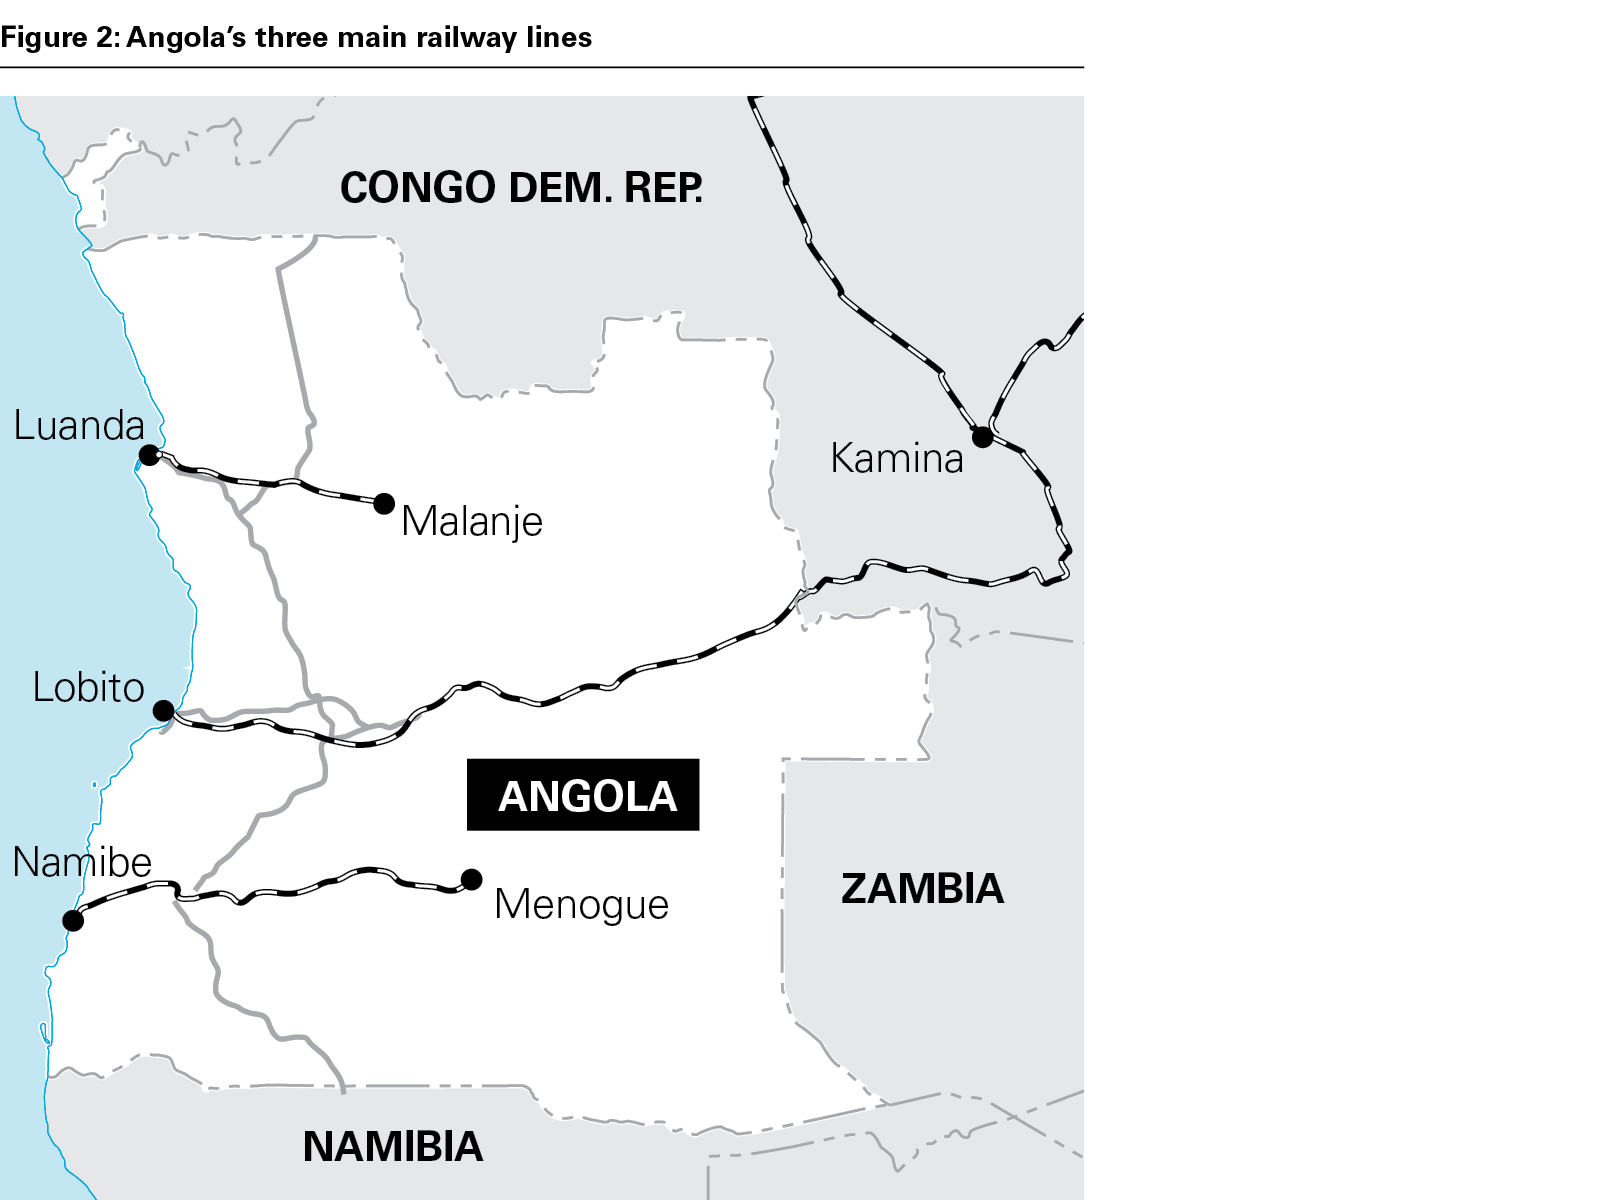 Figure 2: Angola's three main railway lines (PNG)